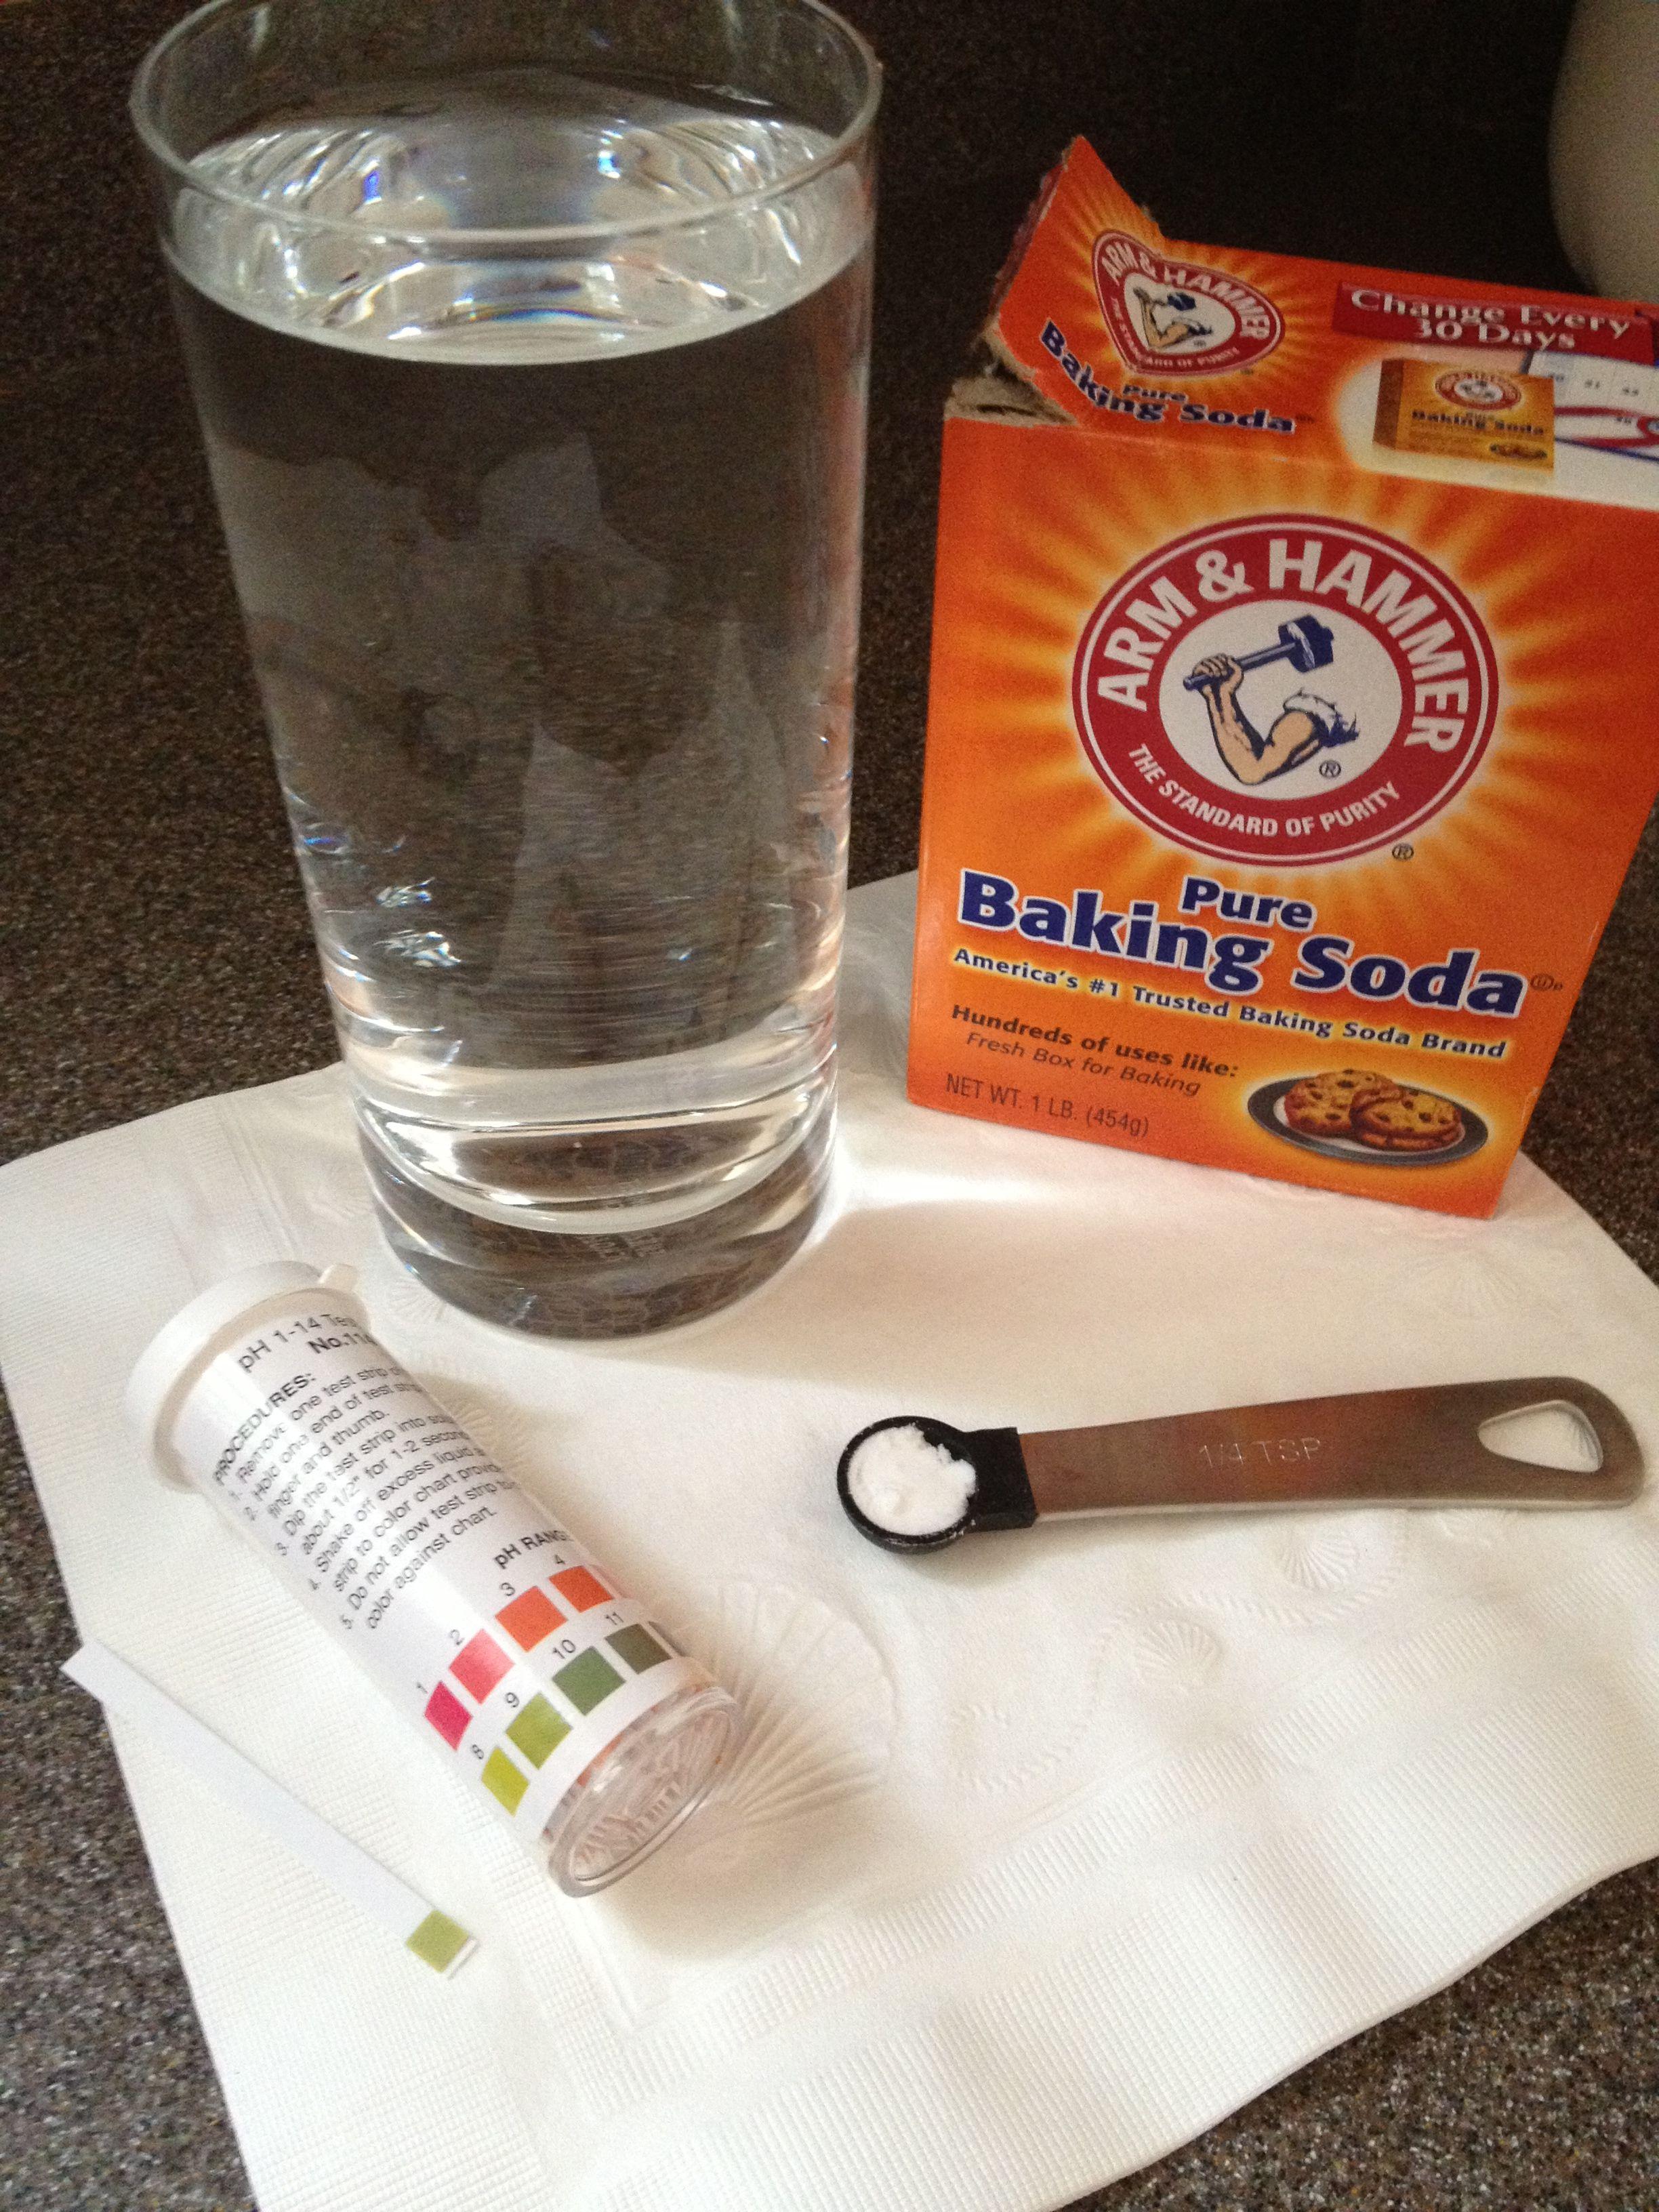 Add 1/4 tsp baking soda to 8 oz water = 8.5% Alkaline Water